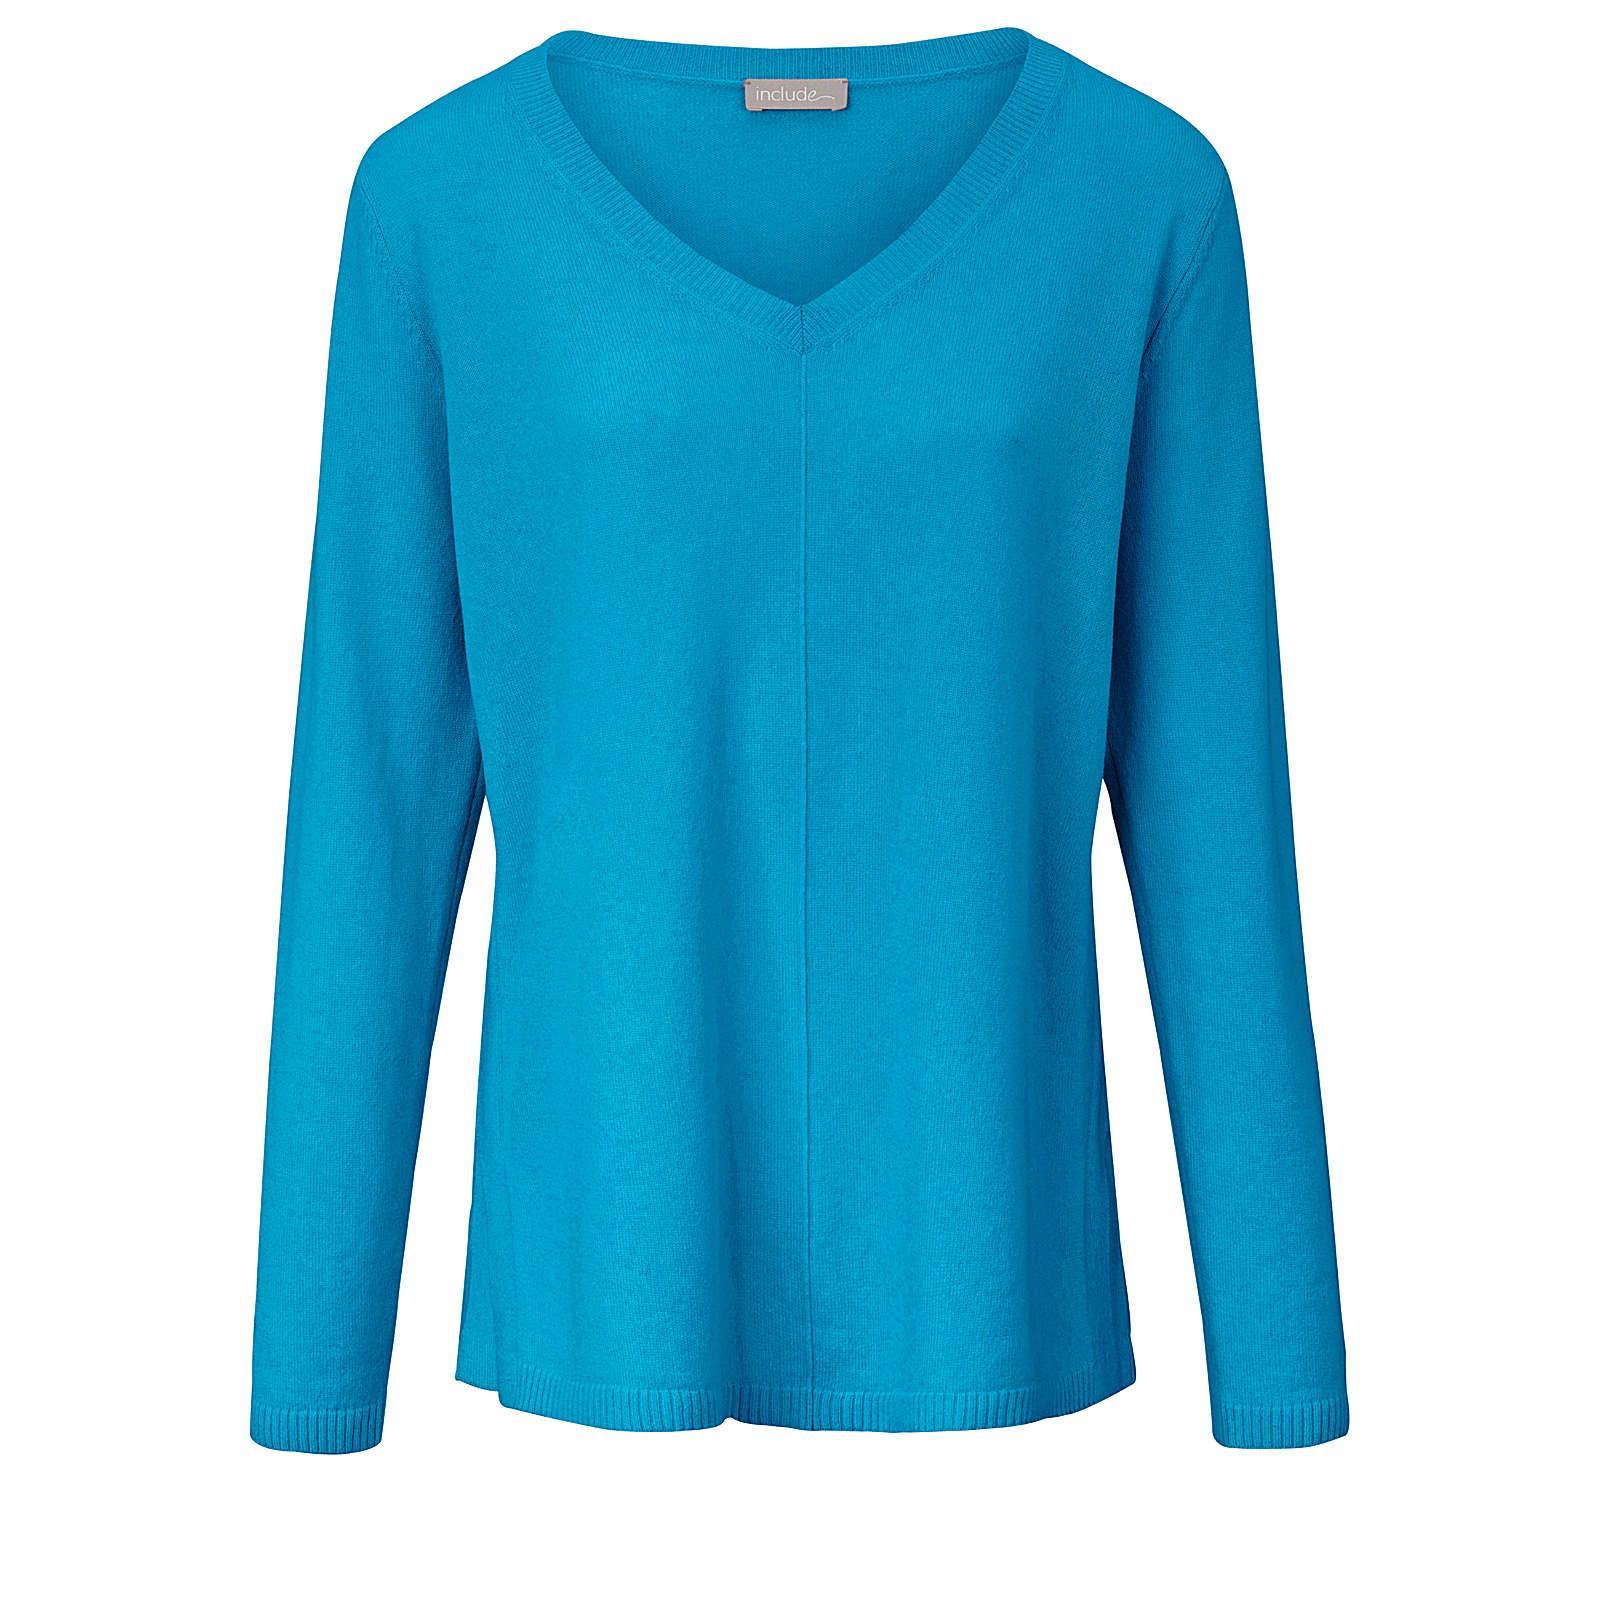 Include V-Pullover V-Pullover aus edlem Kaschmir Pullover blau Damen Gr. 46